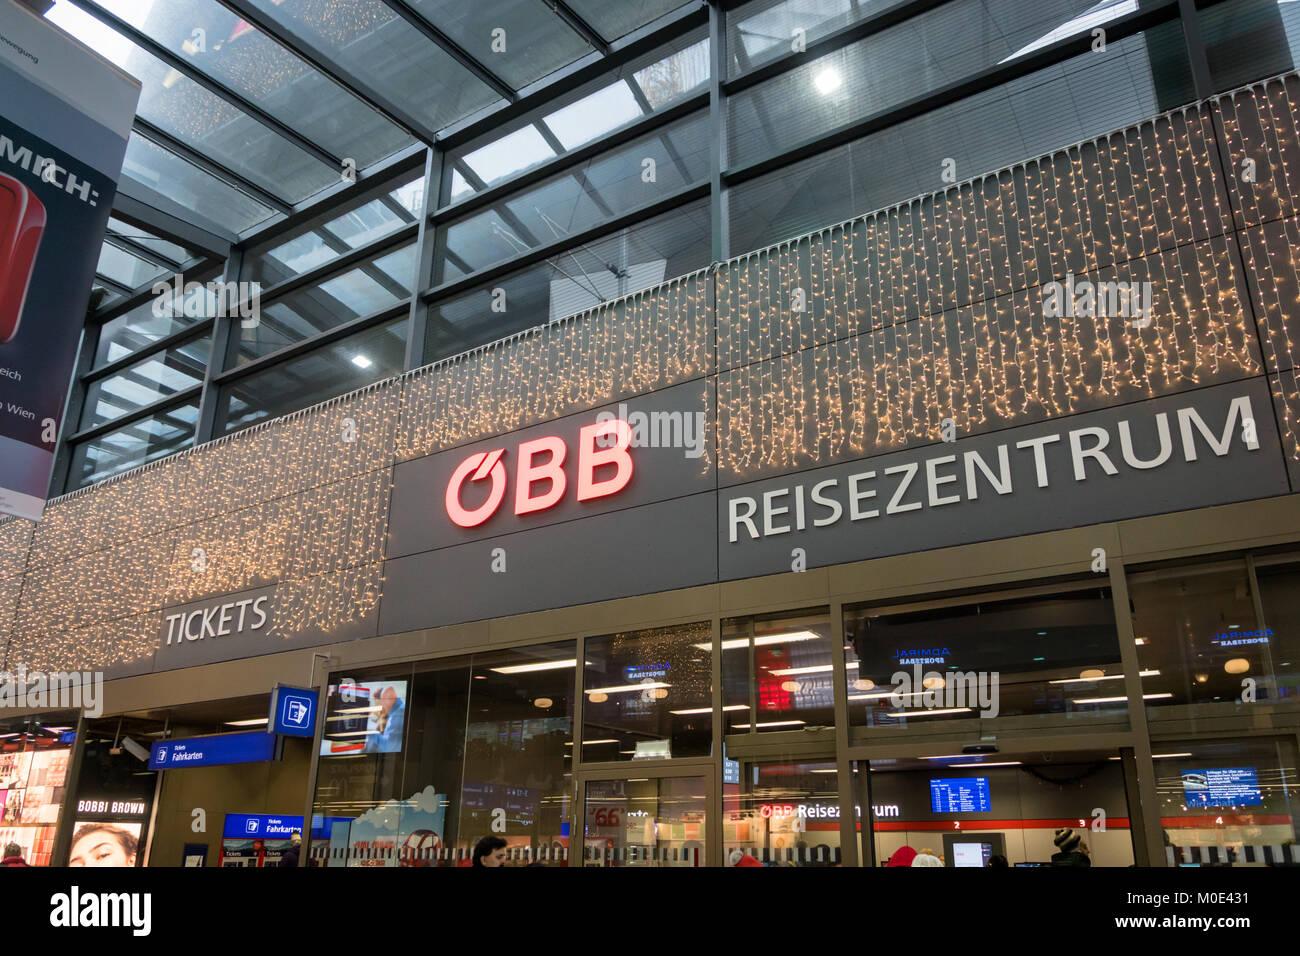 Vienna, Austria - December 2017: OBB ticket service center at the main railway station in Vienna. OBB, The Austrian - Stock Image